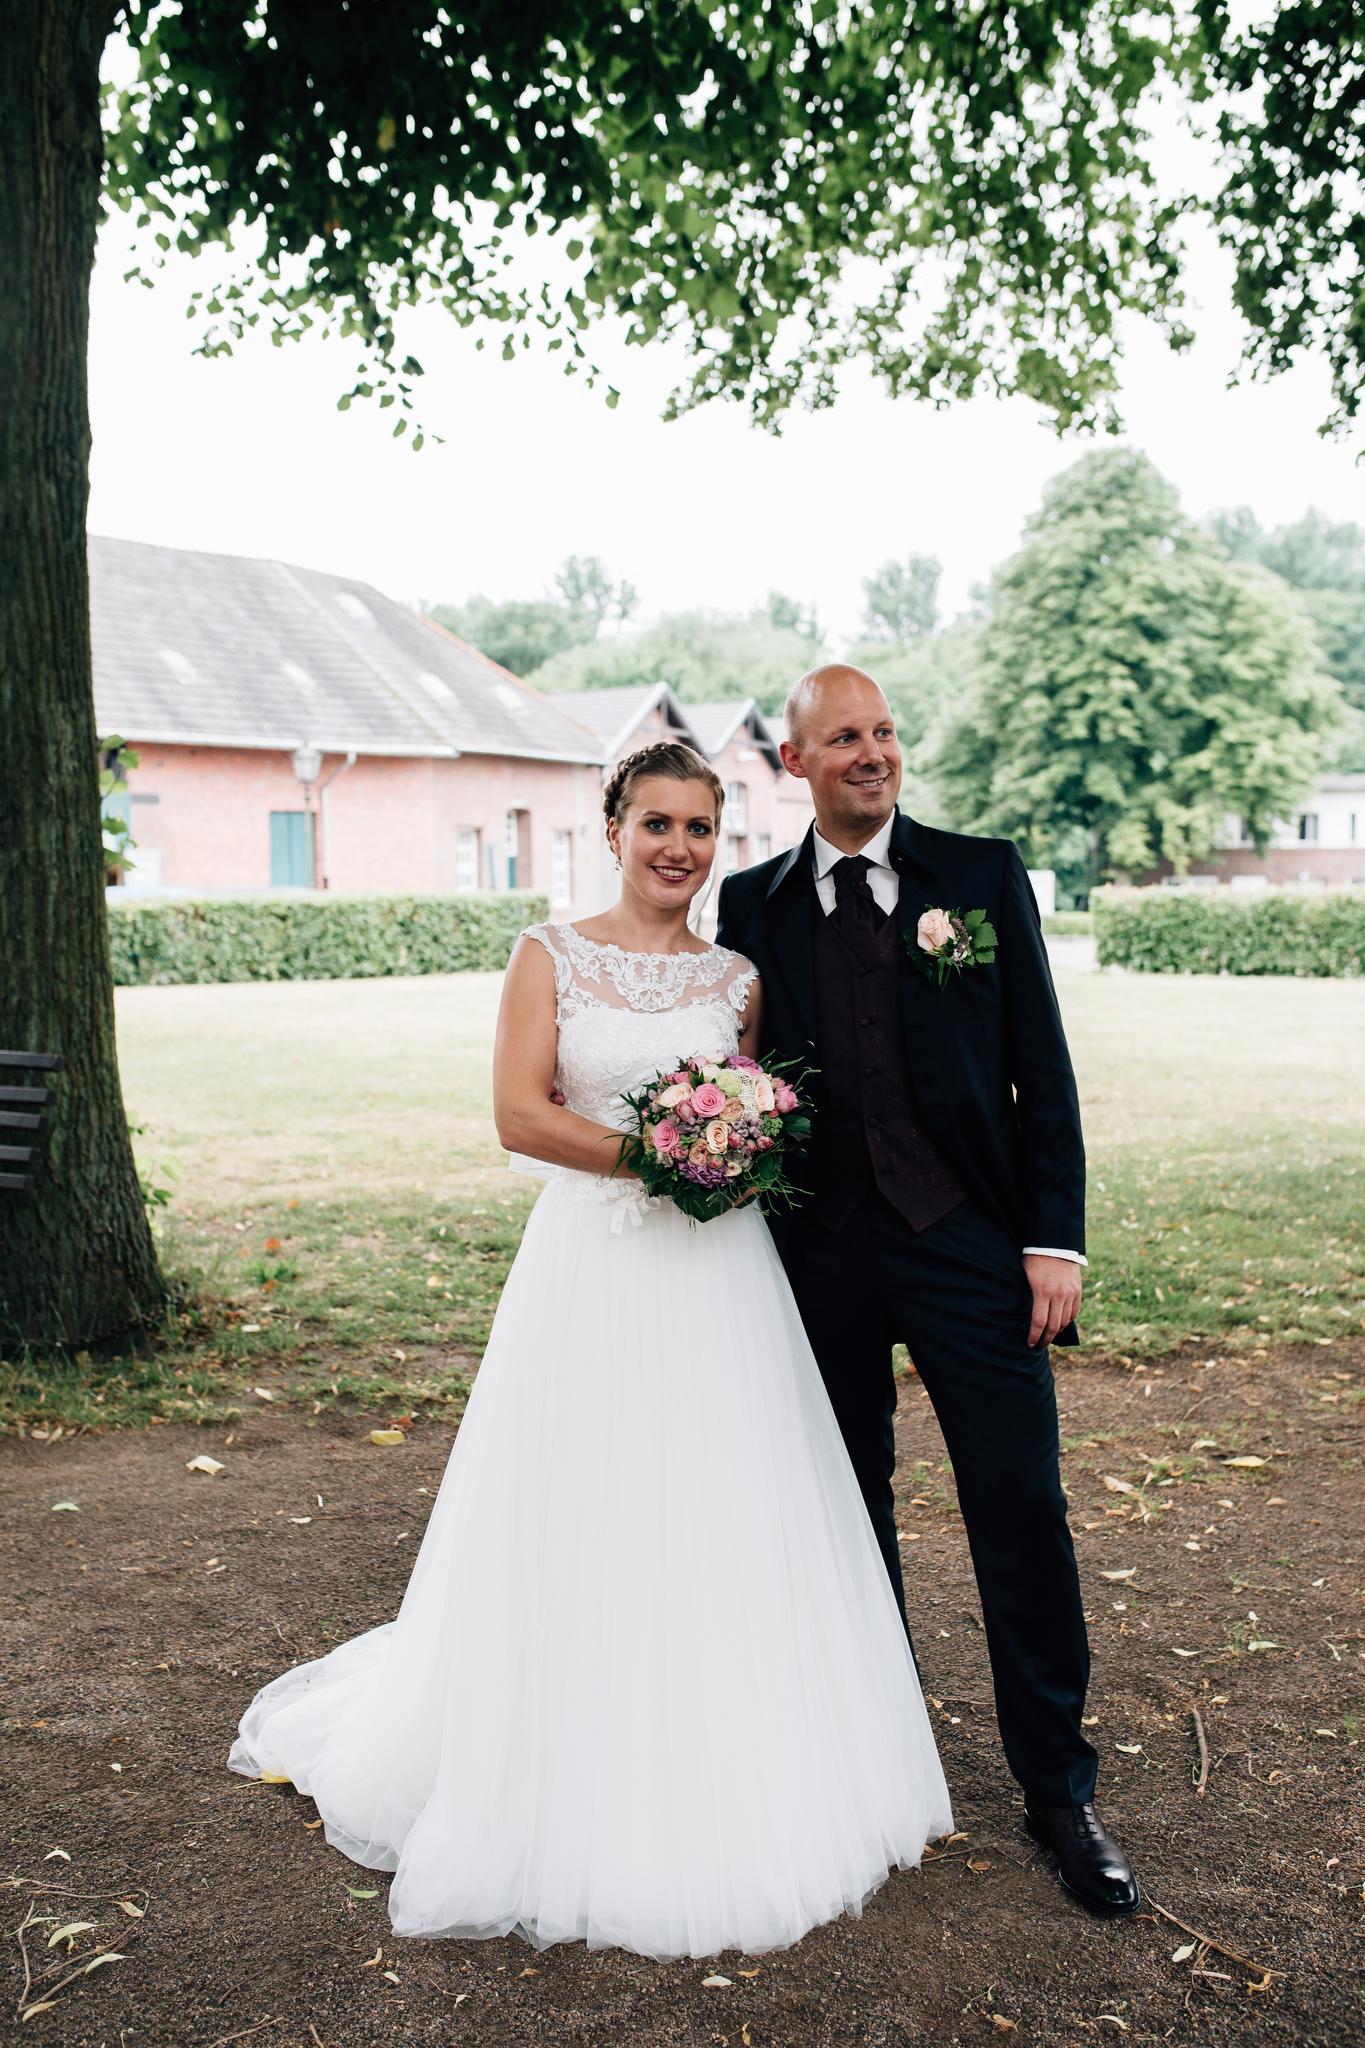 Claudia Krawinkel Fotografie Hochzeitsfotograf Essen Düsseldorf Dormagen Kloster Knechtsteden Hochzeitsreportage Hochzeit Knechtsteden101